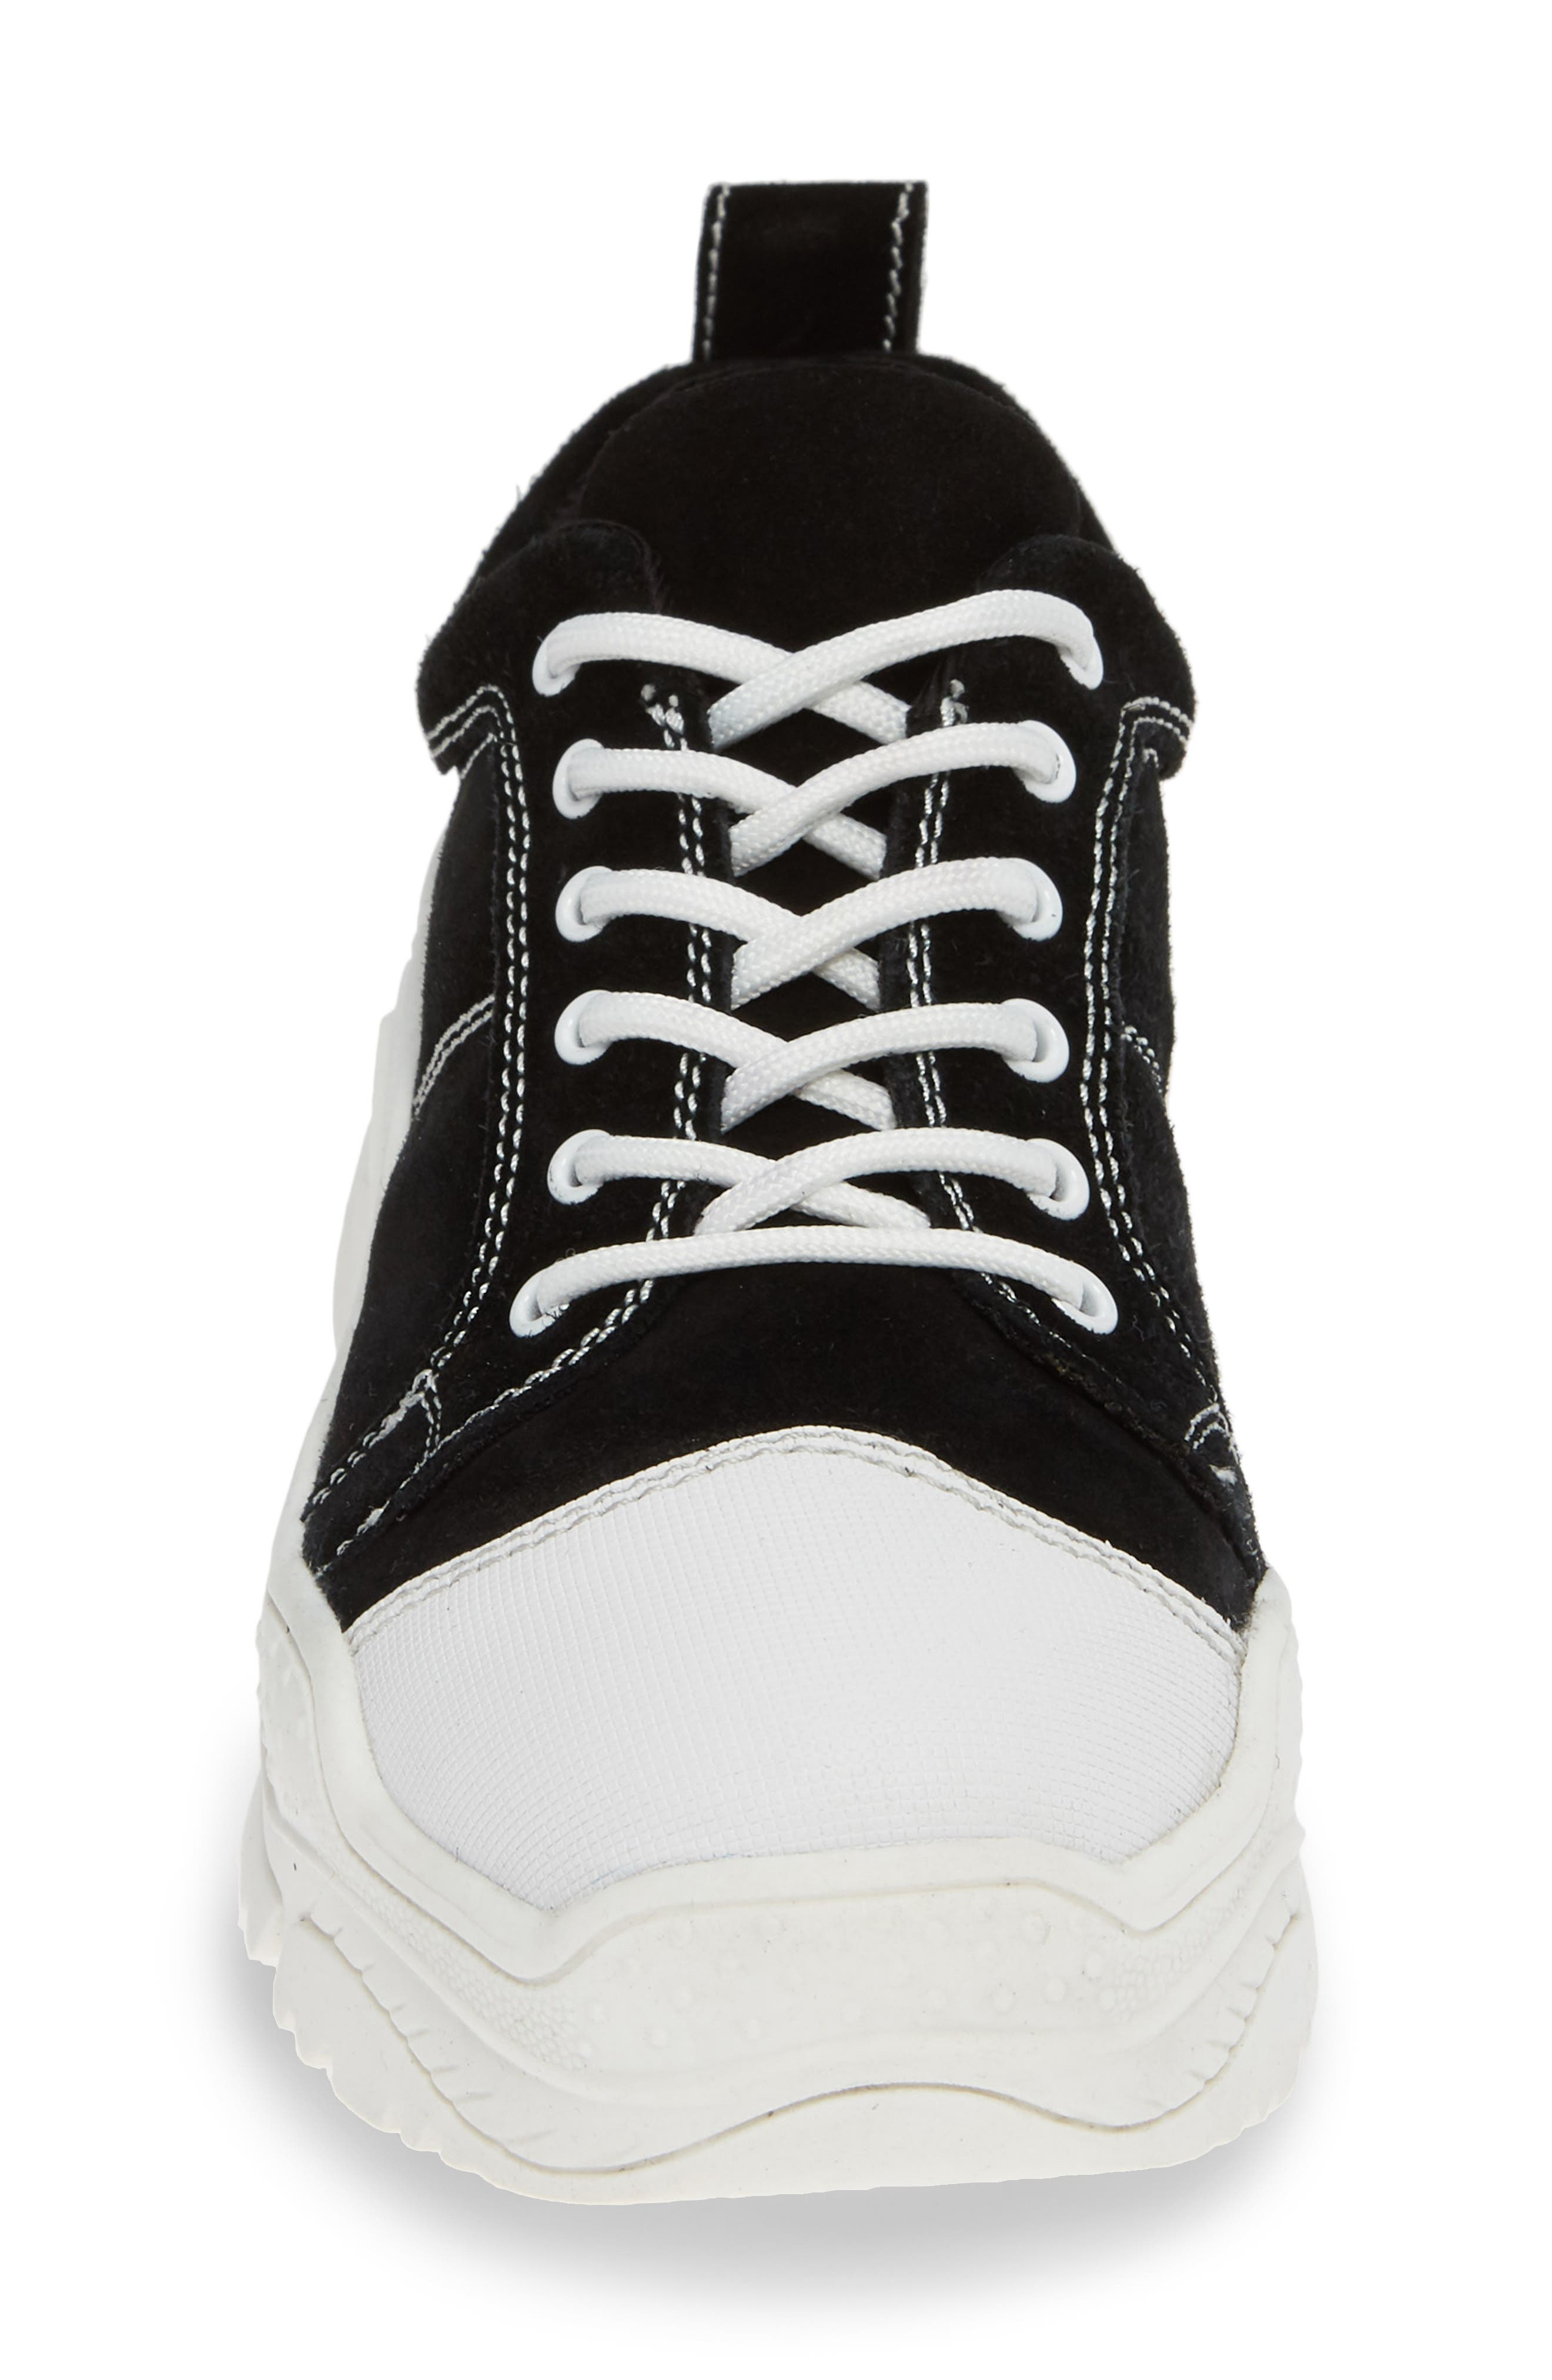 JEFFREY CAMPBELL,                             Remnant Sneaker,                             Alternate thumbnail 4, color,                             BLACK SUEDE WHITE